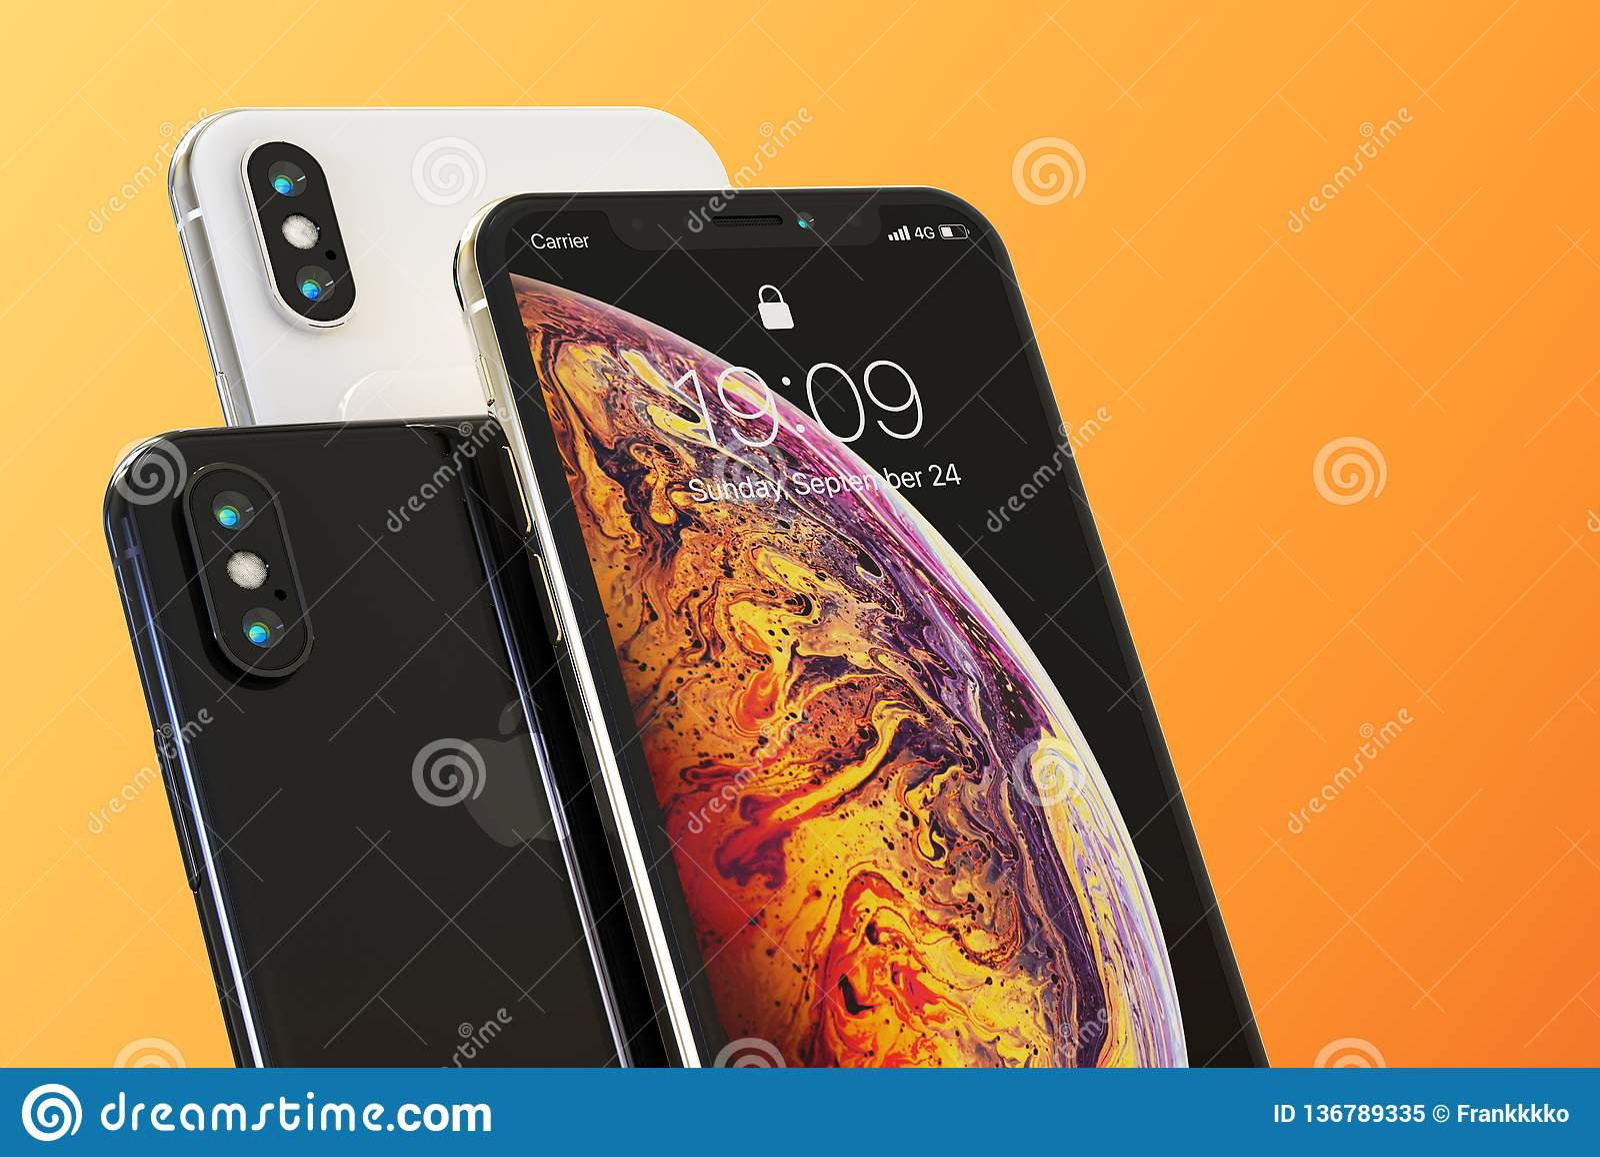 3 Apple iPhone XS smart phones composition